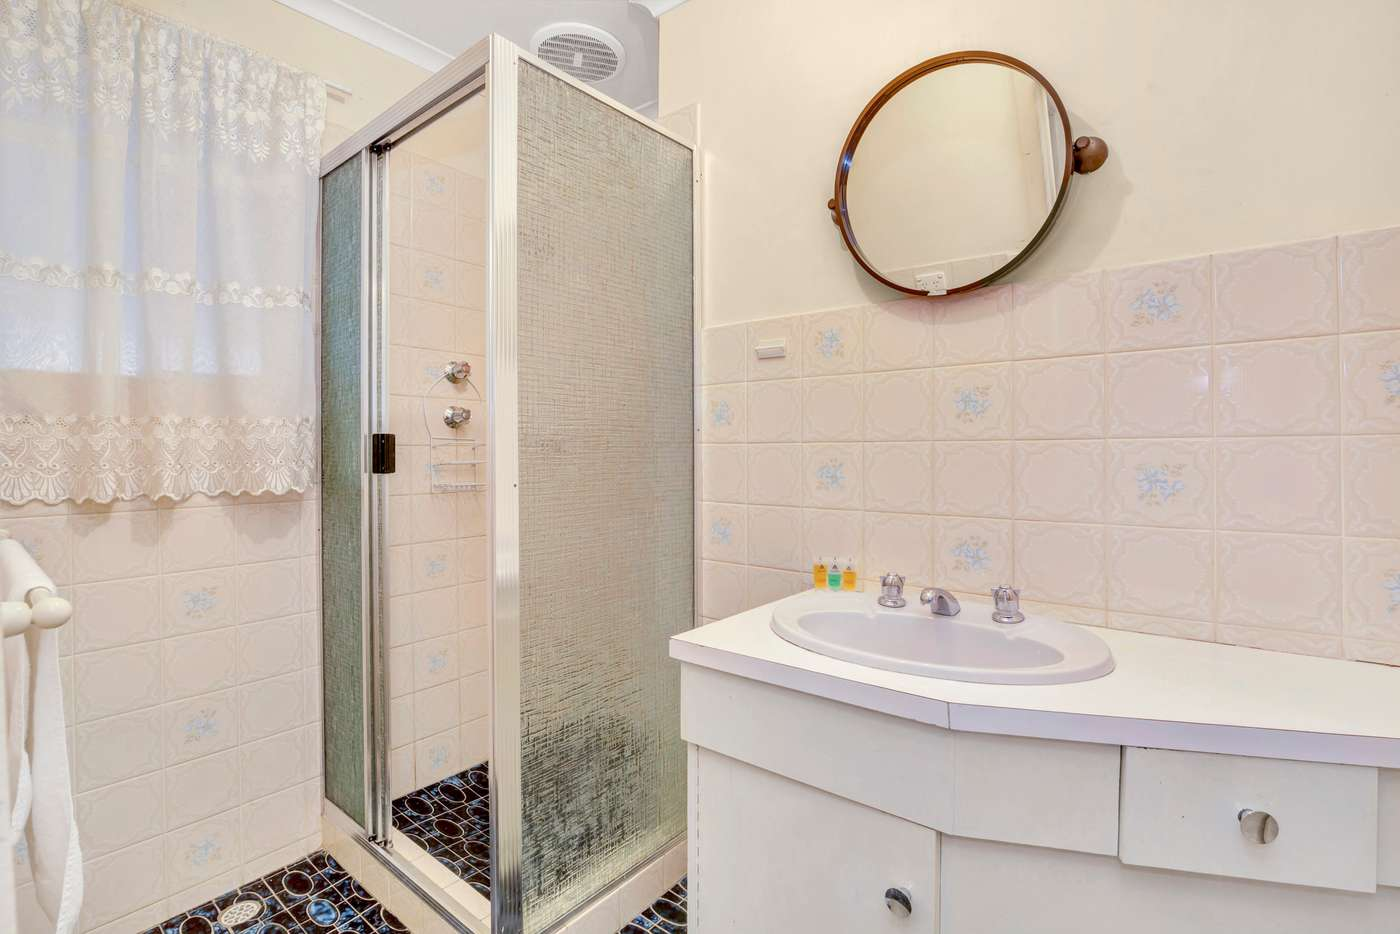 Sixth view of Homely house listing, 33 Aldam Avenue, Aldinga Beach SA 5173